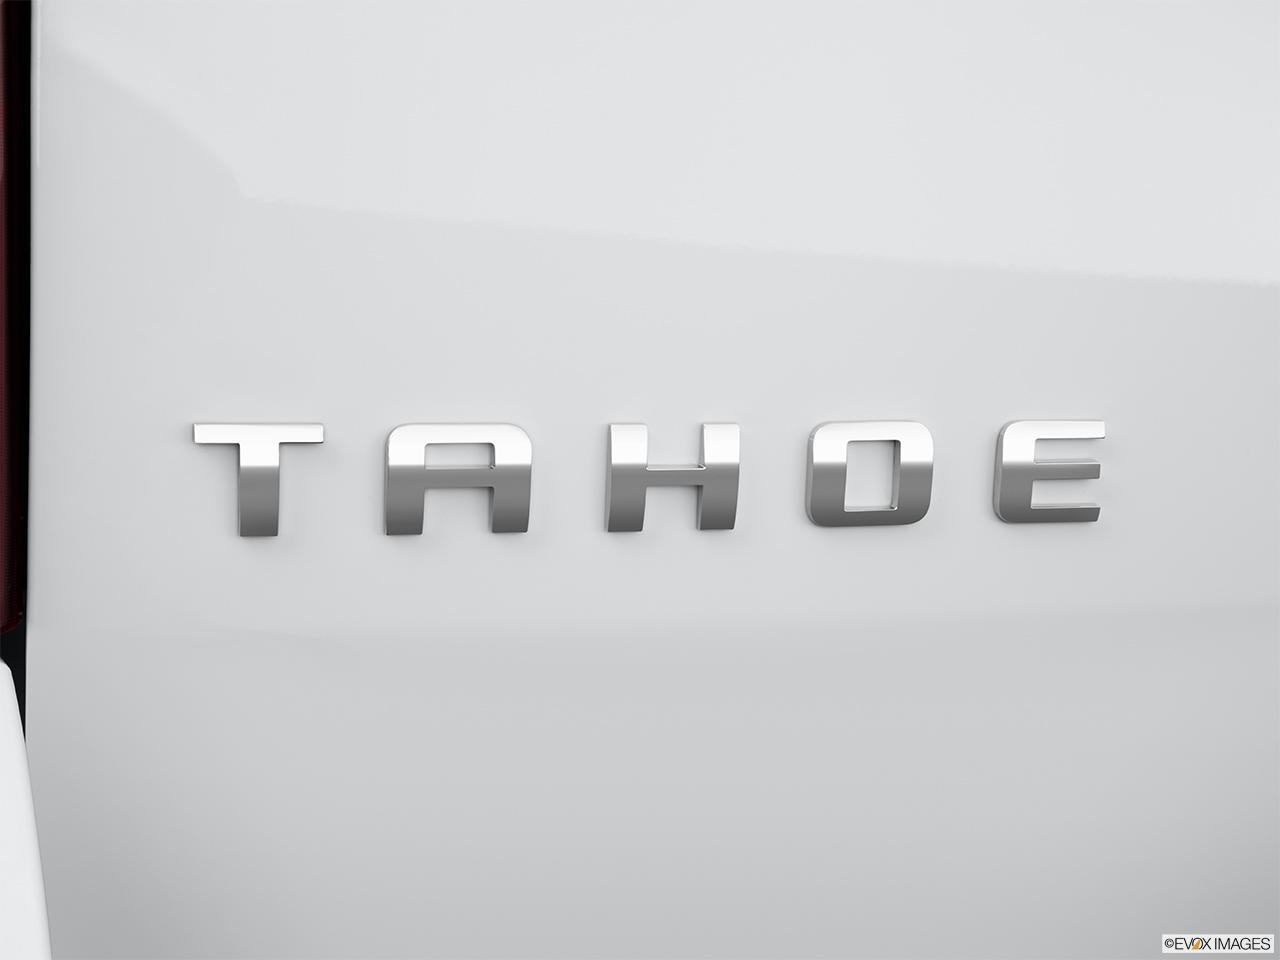 2014 Chevy Tahoe >> 2014 Chevrolet Tahoe 2WD LS - Rear model badge/emblem